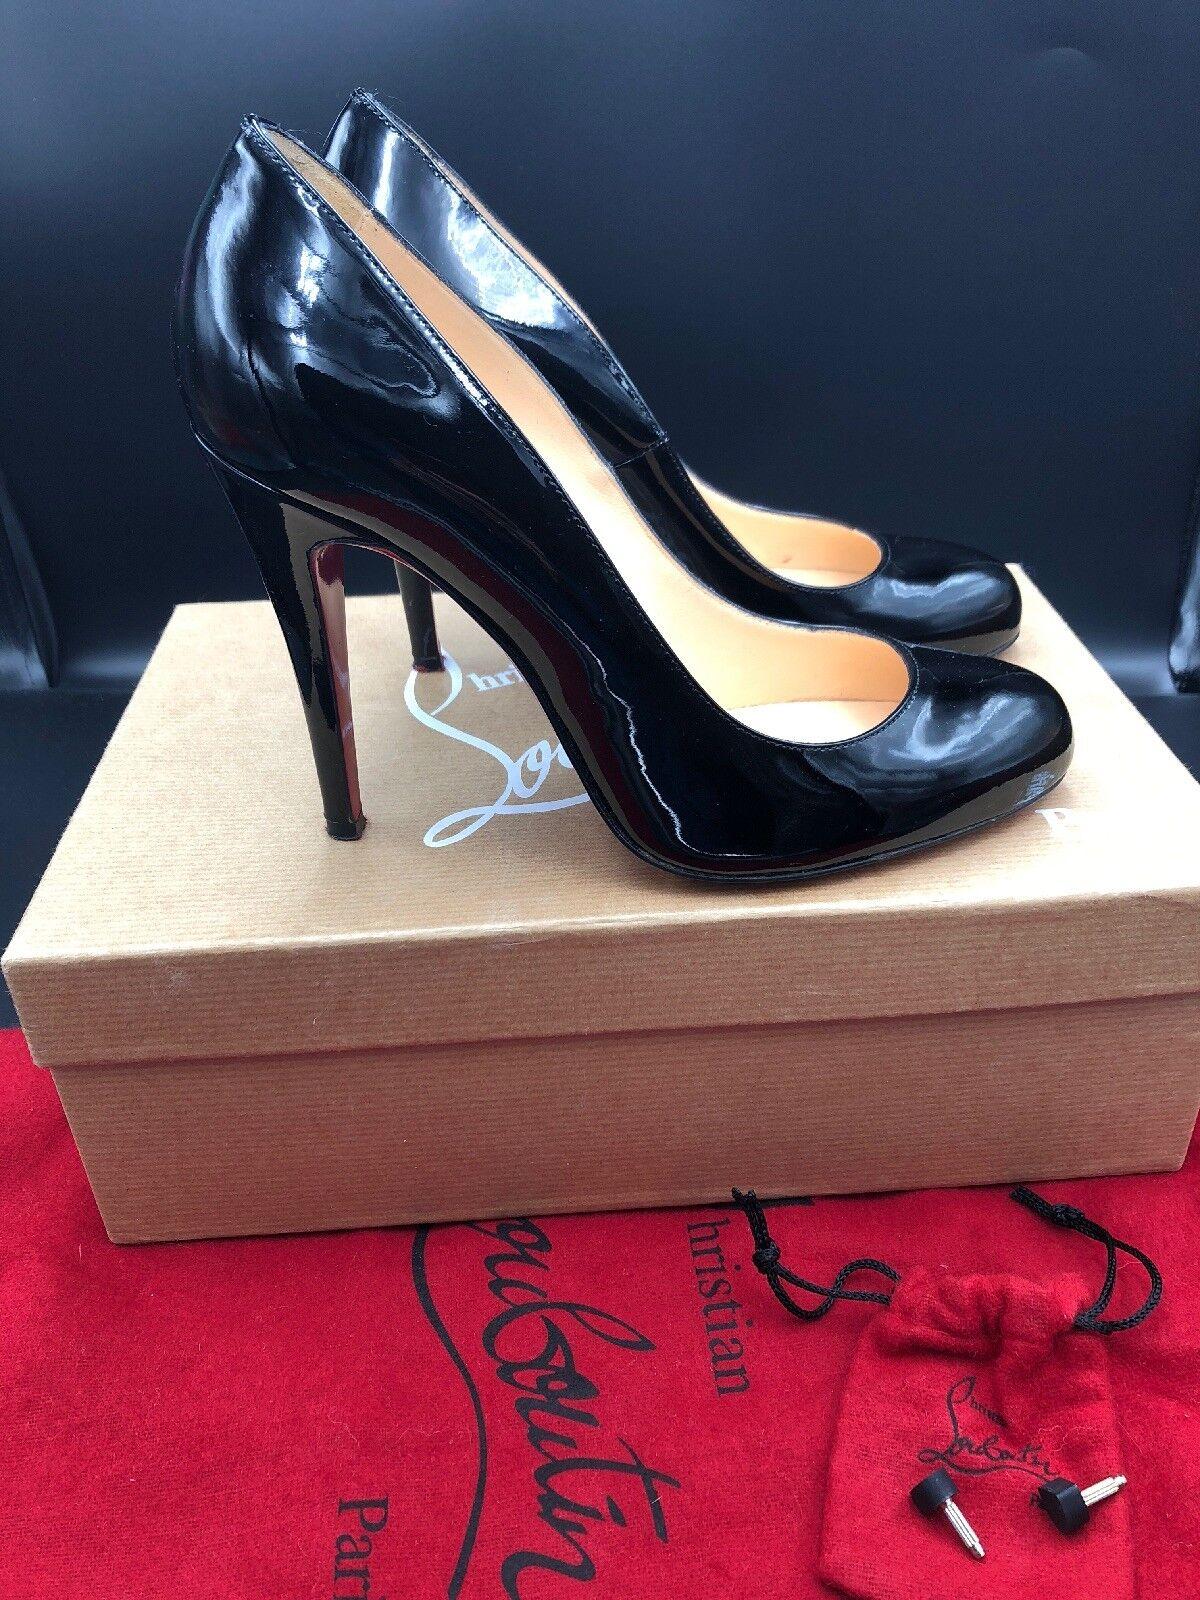 Christian Louboutin ron Ron 100 noir court Verni Verni Verni Talons Chaussures Taille UK 4 EU 37 54f988